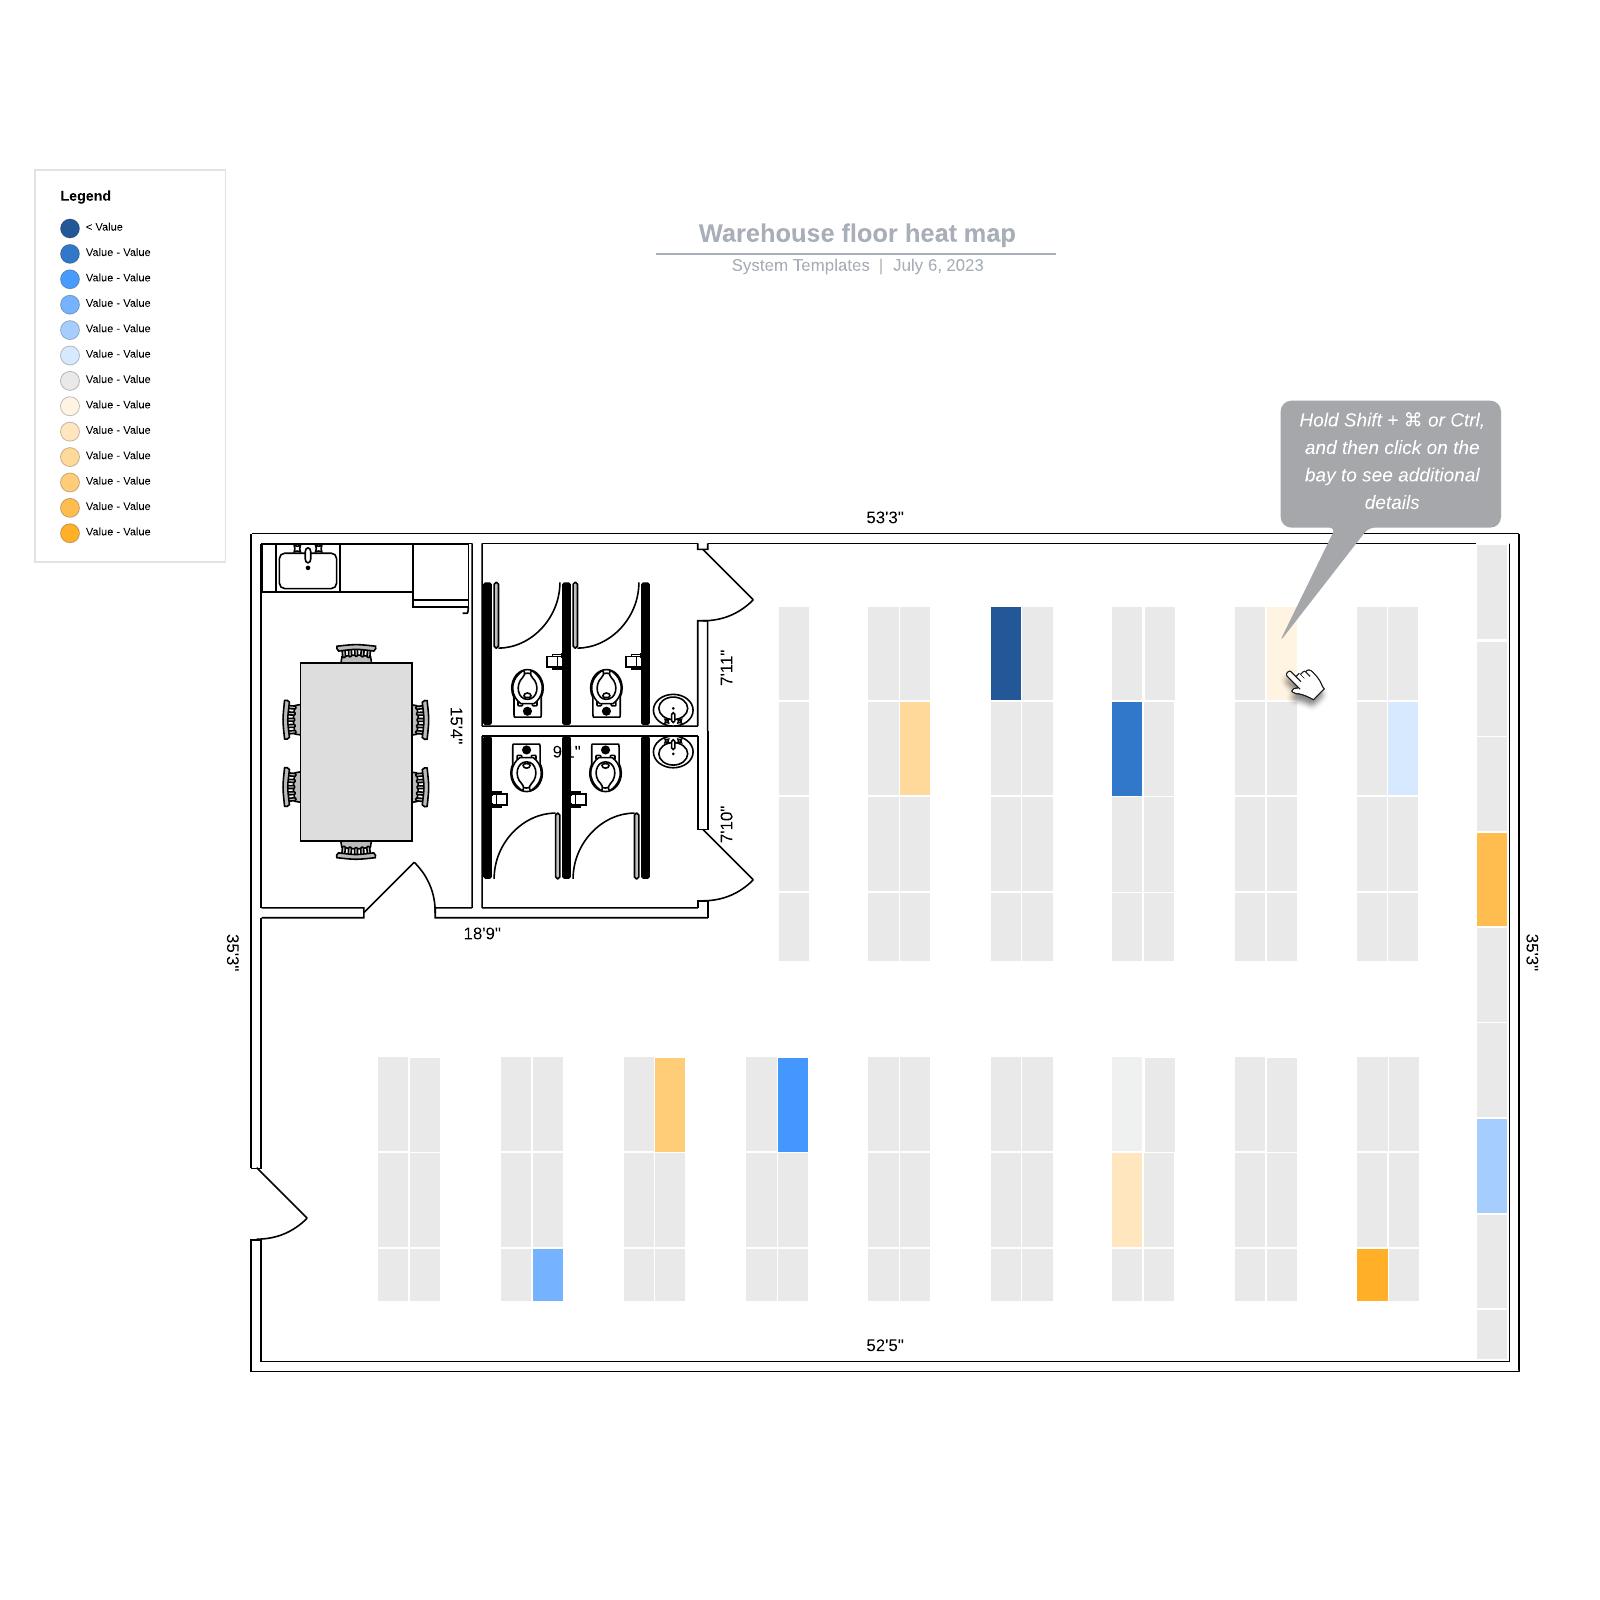 Warehouse floor heat map